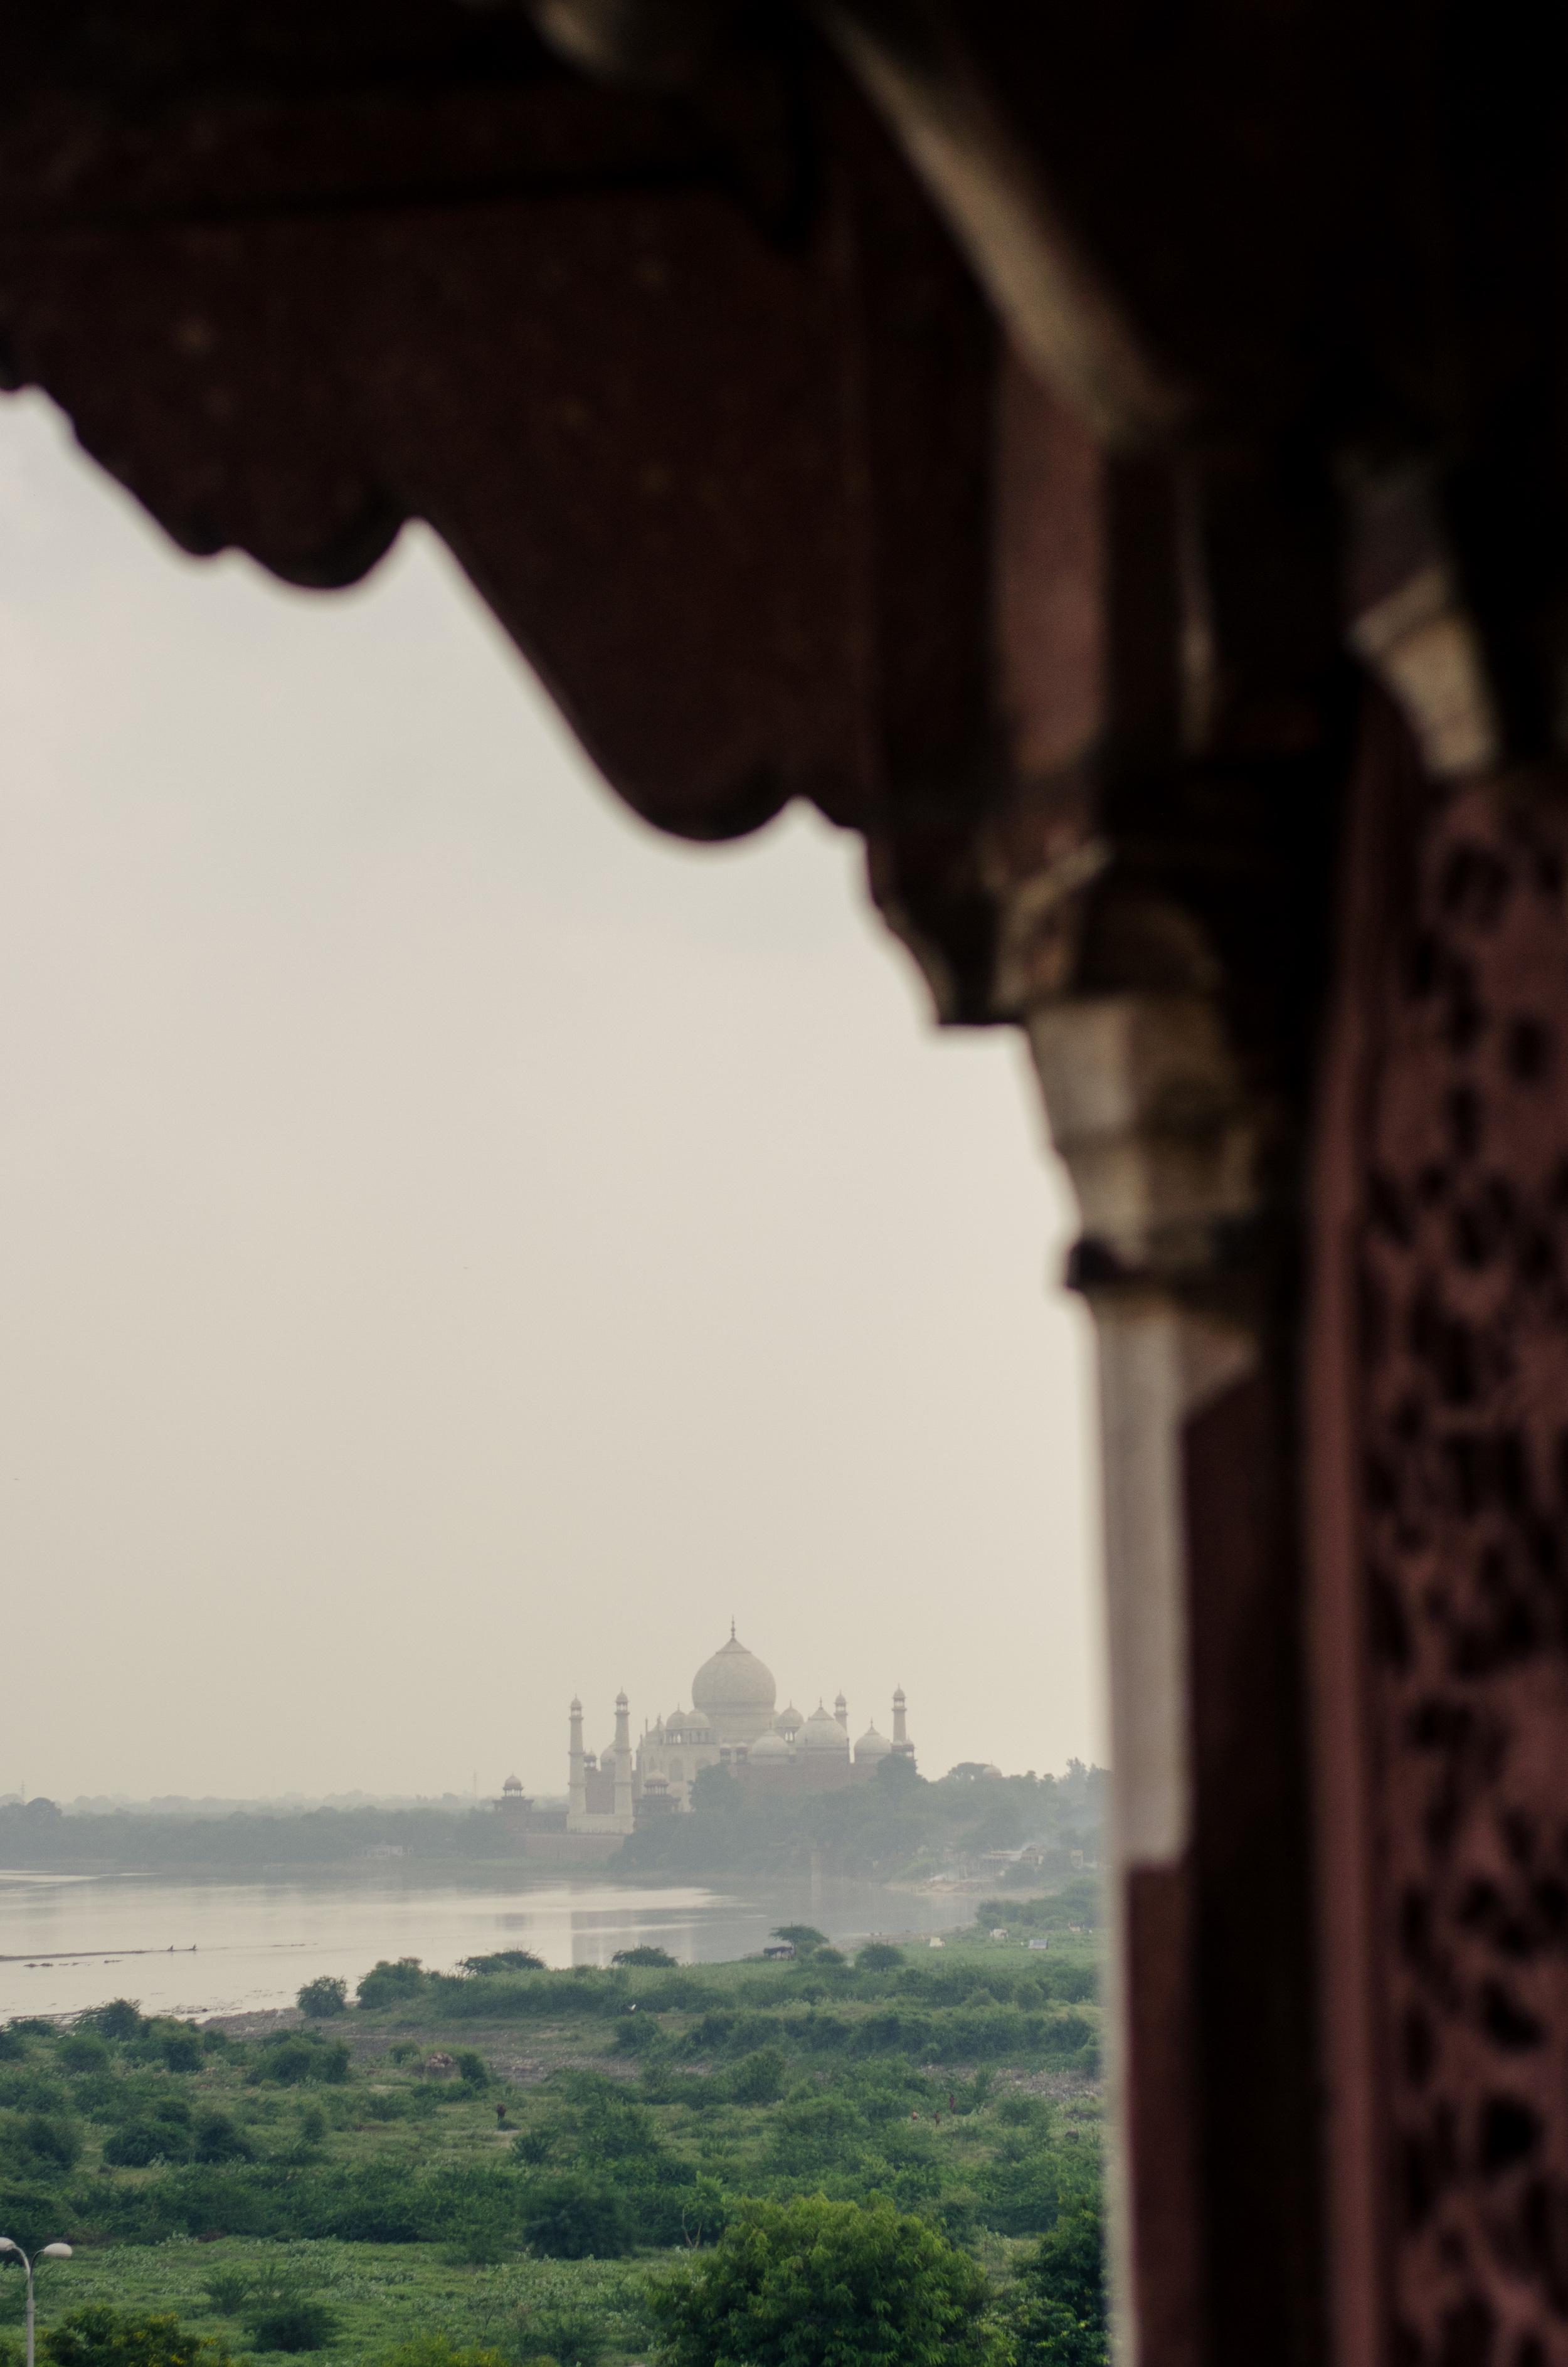 travel_photographer_india_adventure_explore-10.jpg